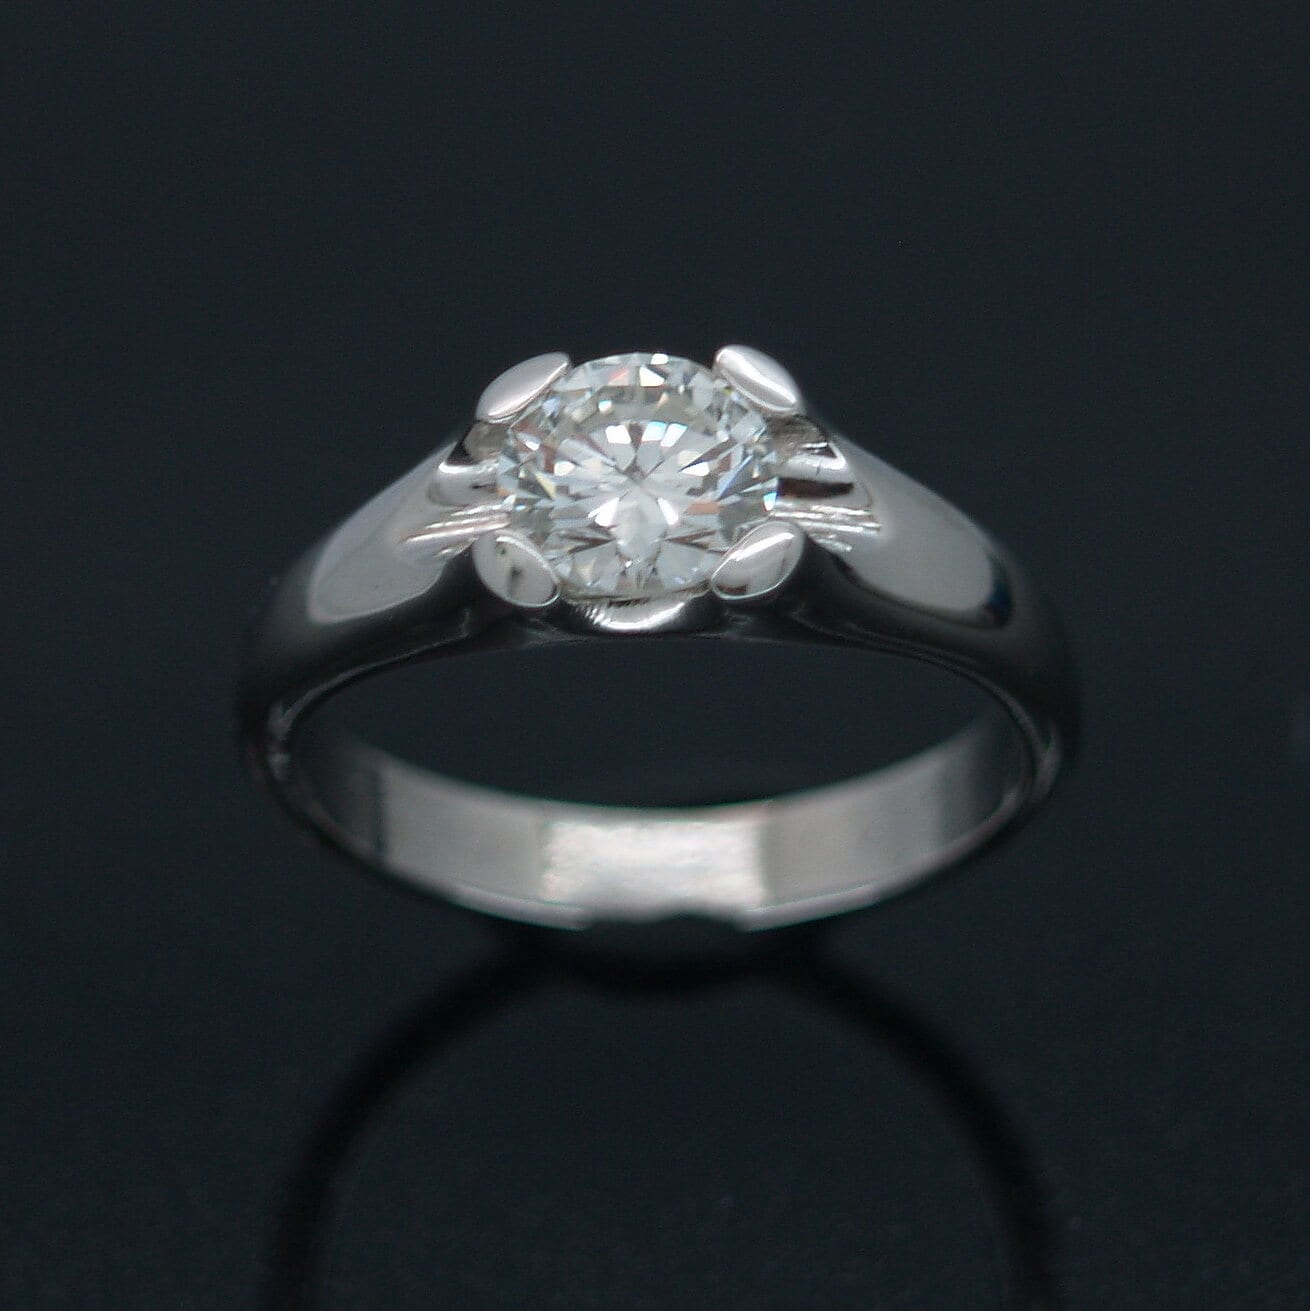 Modern Palladium and Round Brilliant cut Diamond bespoke engagement ring by Julian Stephens